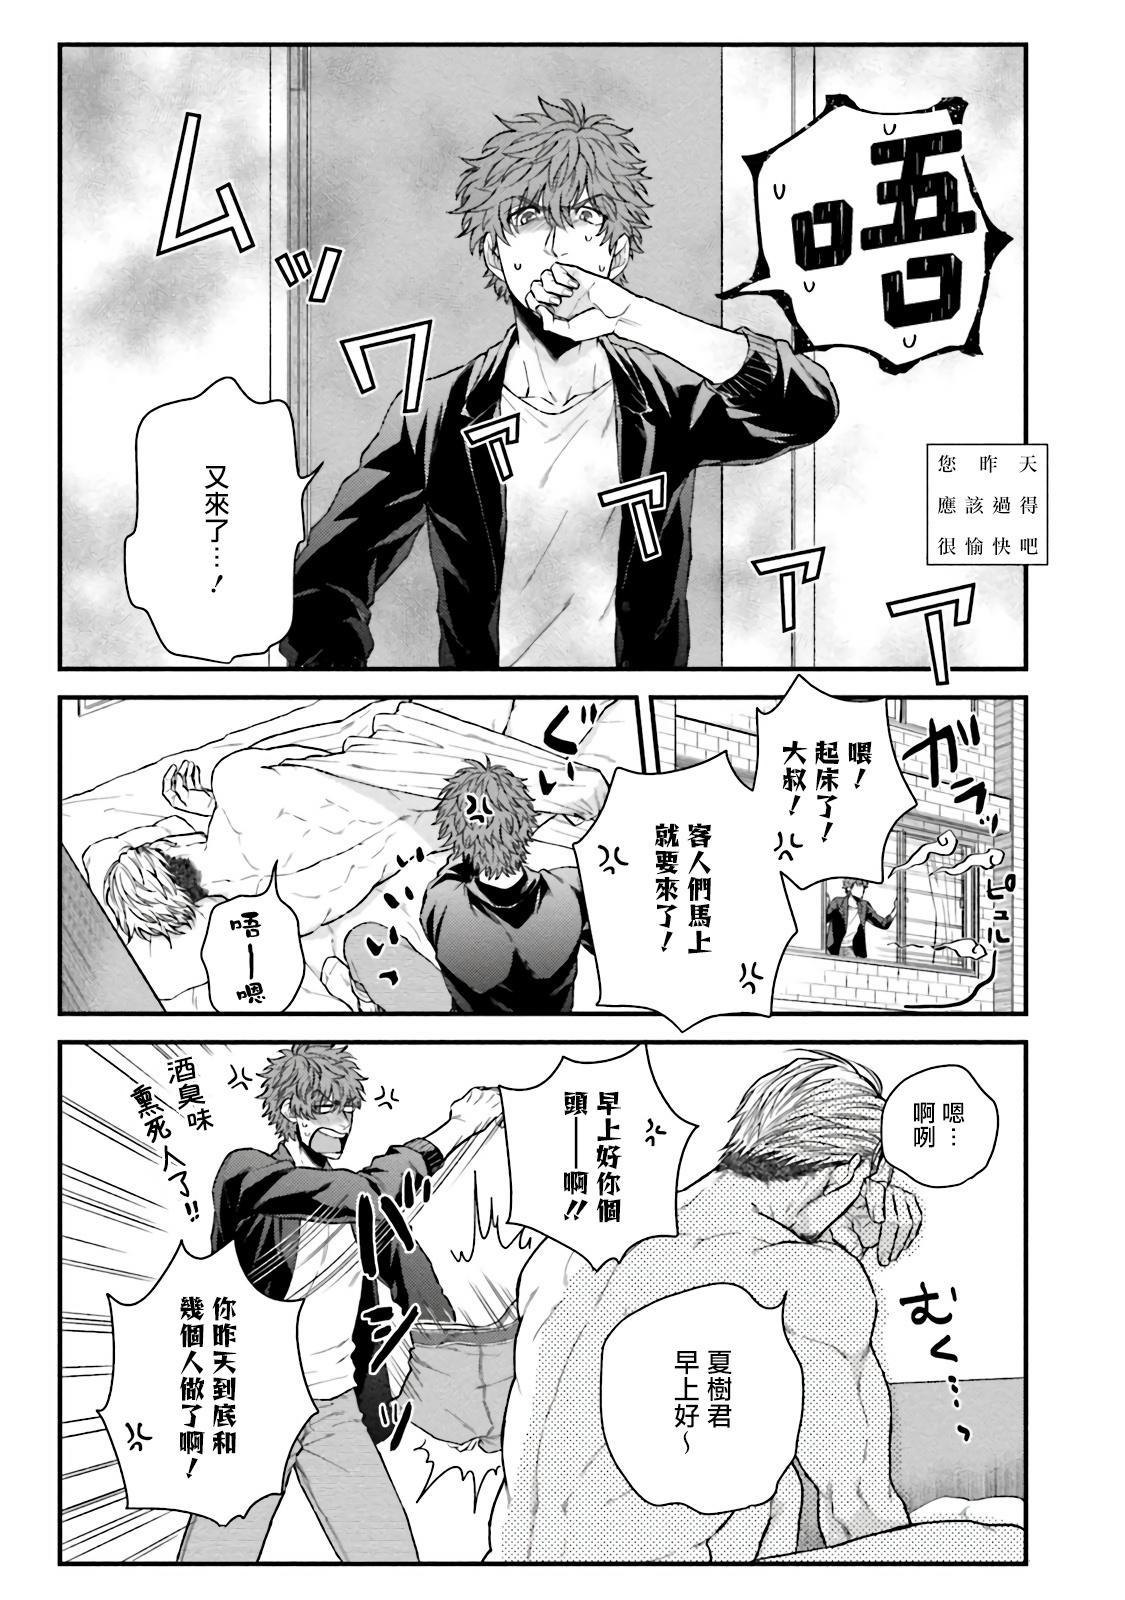 Kinou wa Otanoshimi Deshita ne | 昨天过得很愉快吧 Ch. 1-4+特典 4